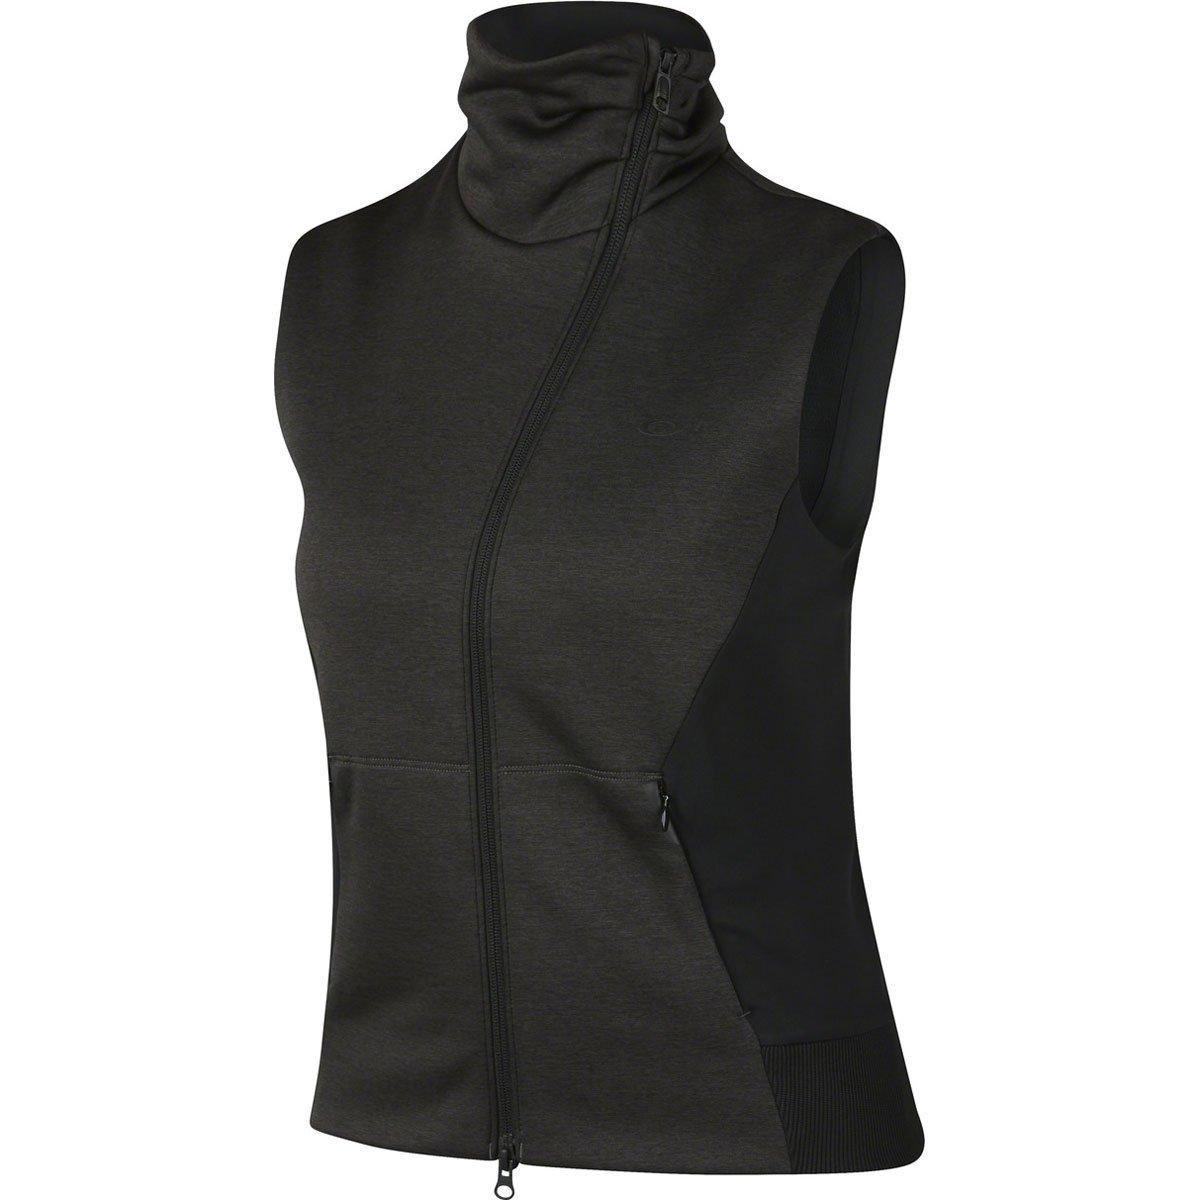 639e31490e Amazon.com  Oakley Womens Off Center Vest  Sports   Outdoors